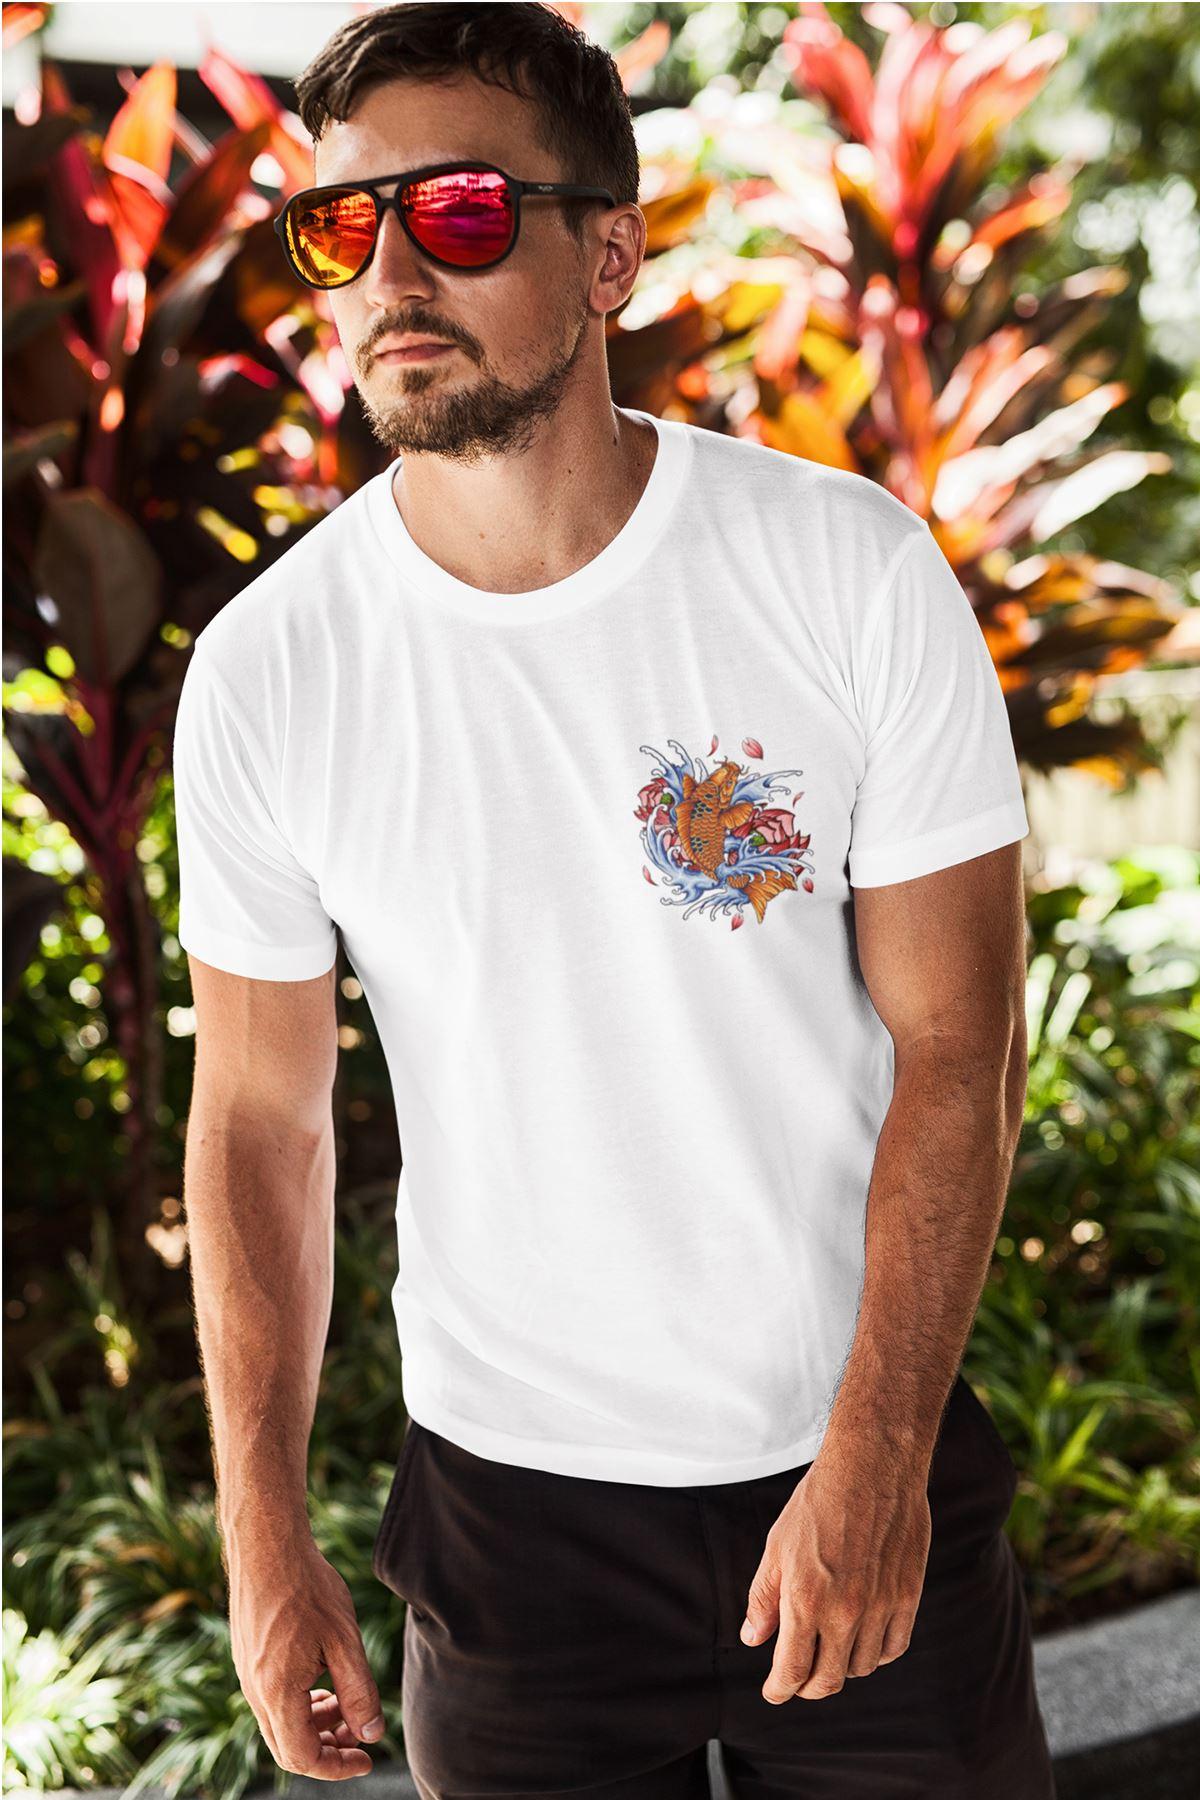 Fish Tattoo 02 Beyaz Erkek Tshirt - Tişört